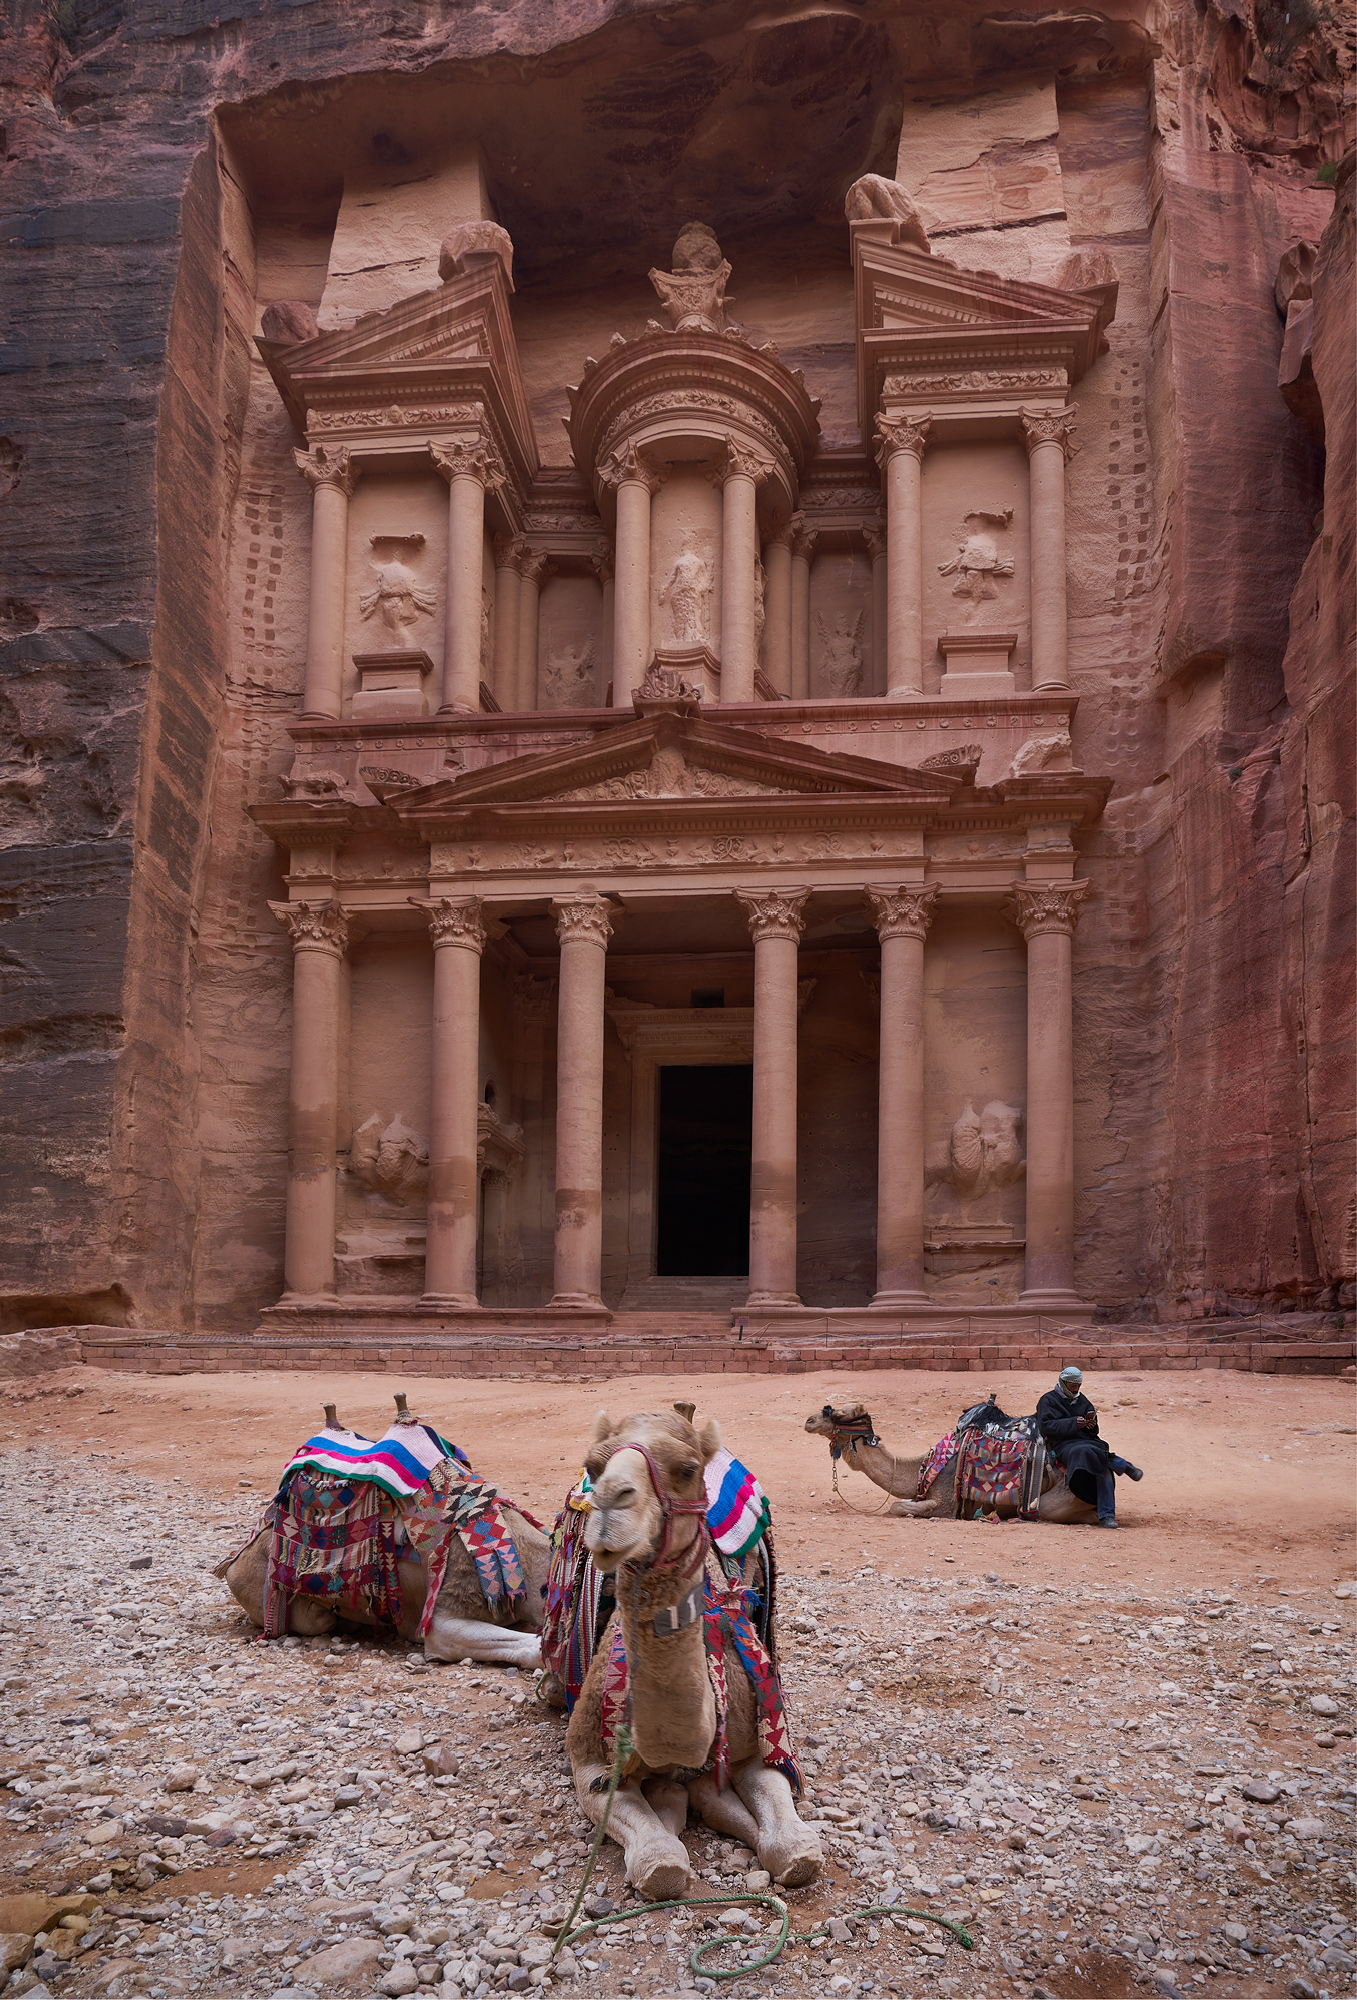 Petra Camel #11 2k by GrahamWelland in GrahamWelland